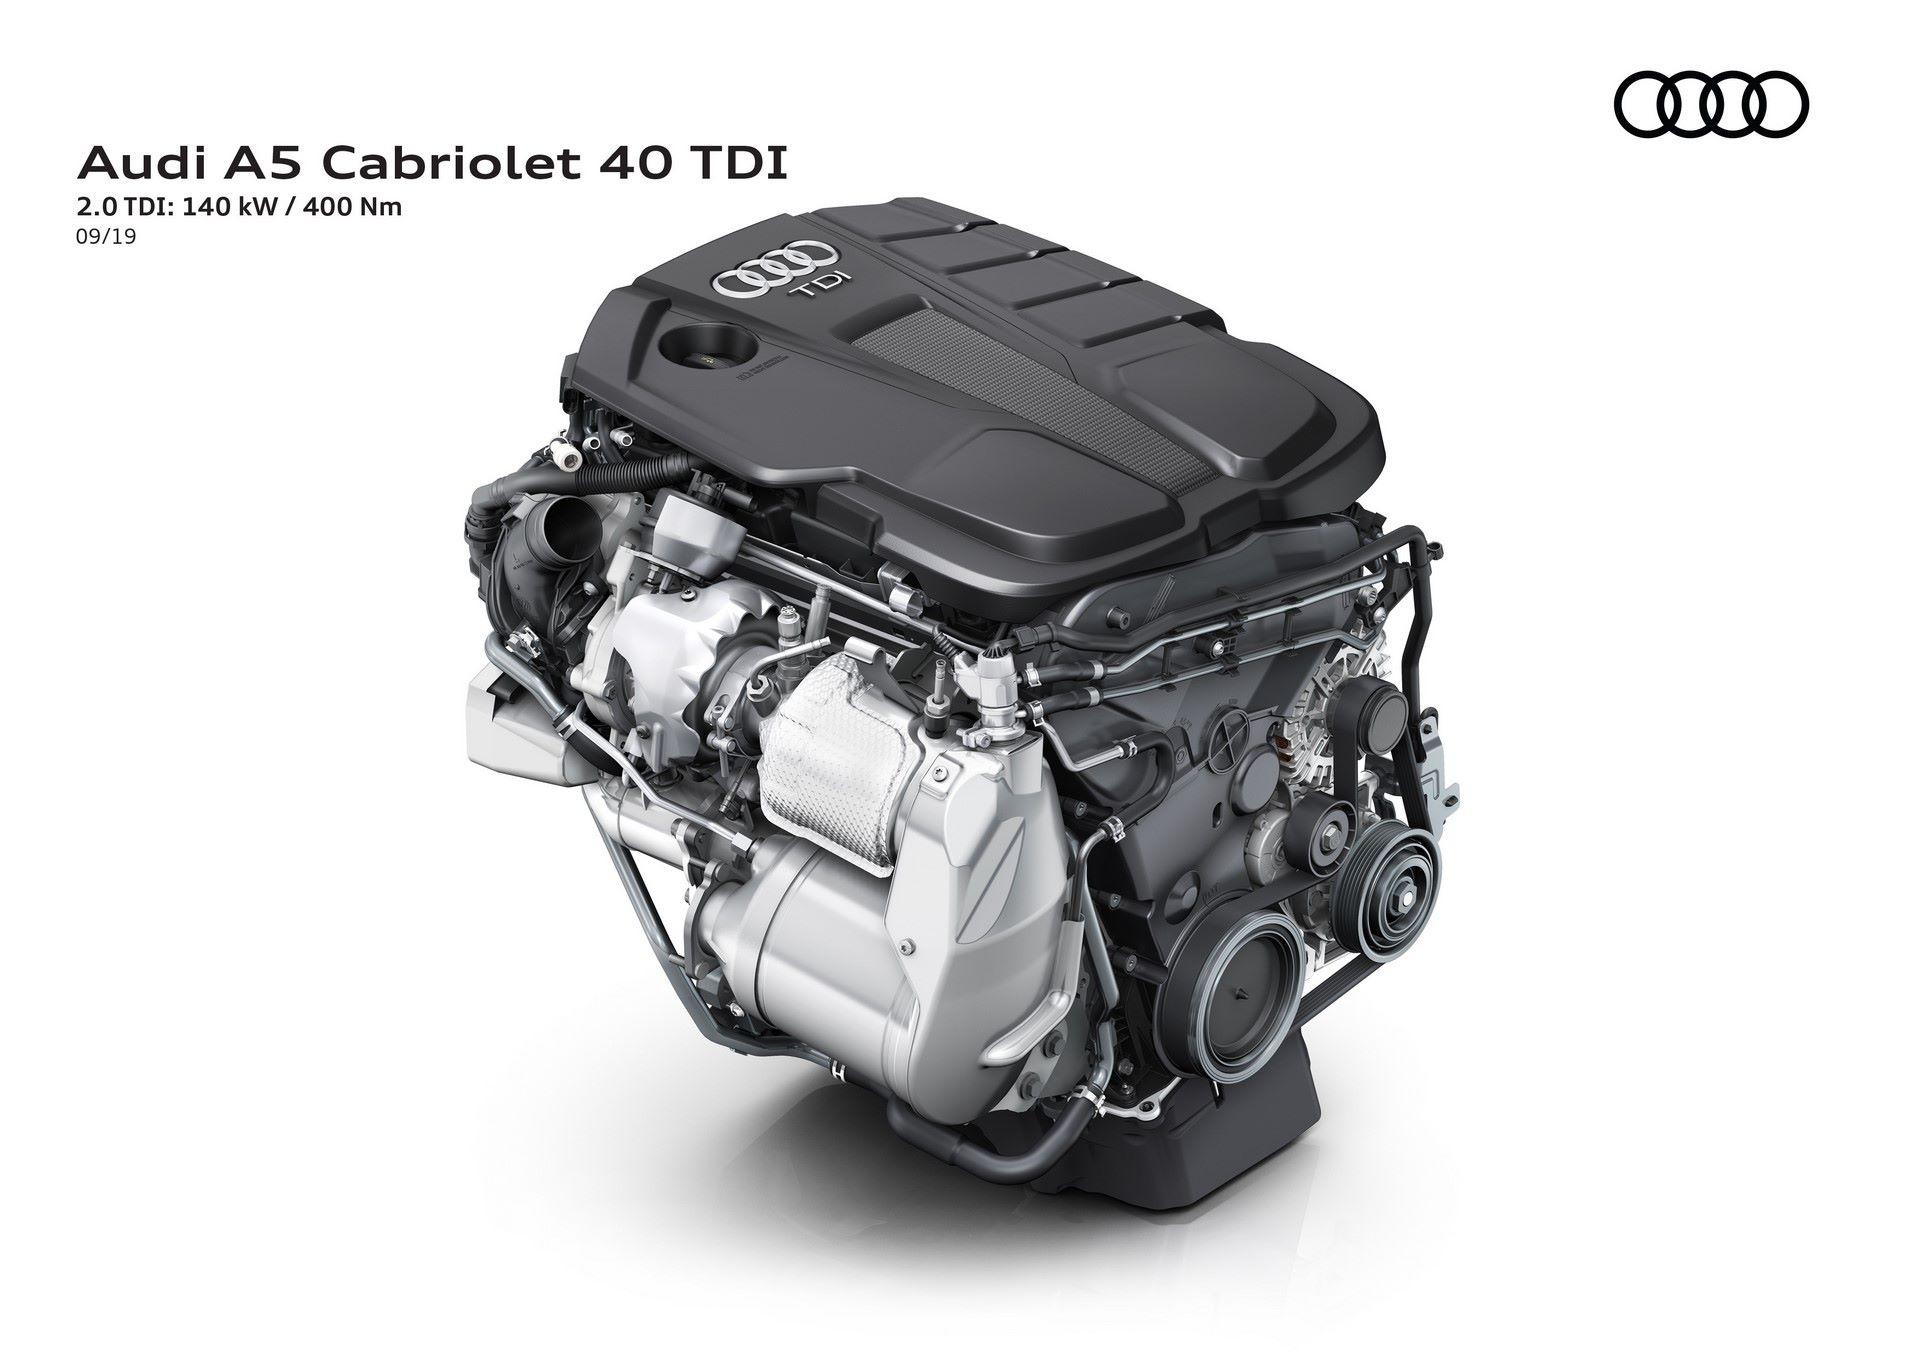 Audi A5 Cabriolet 40 TDI